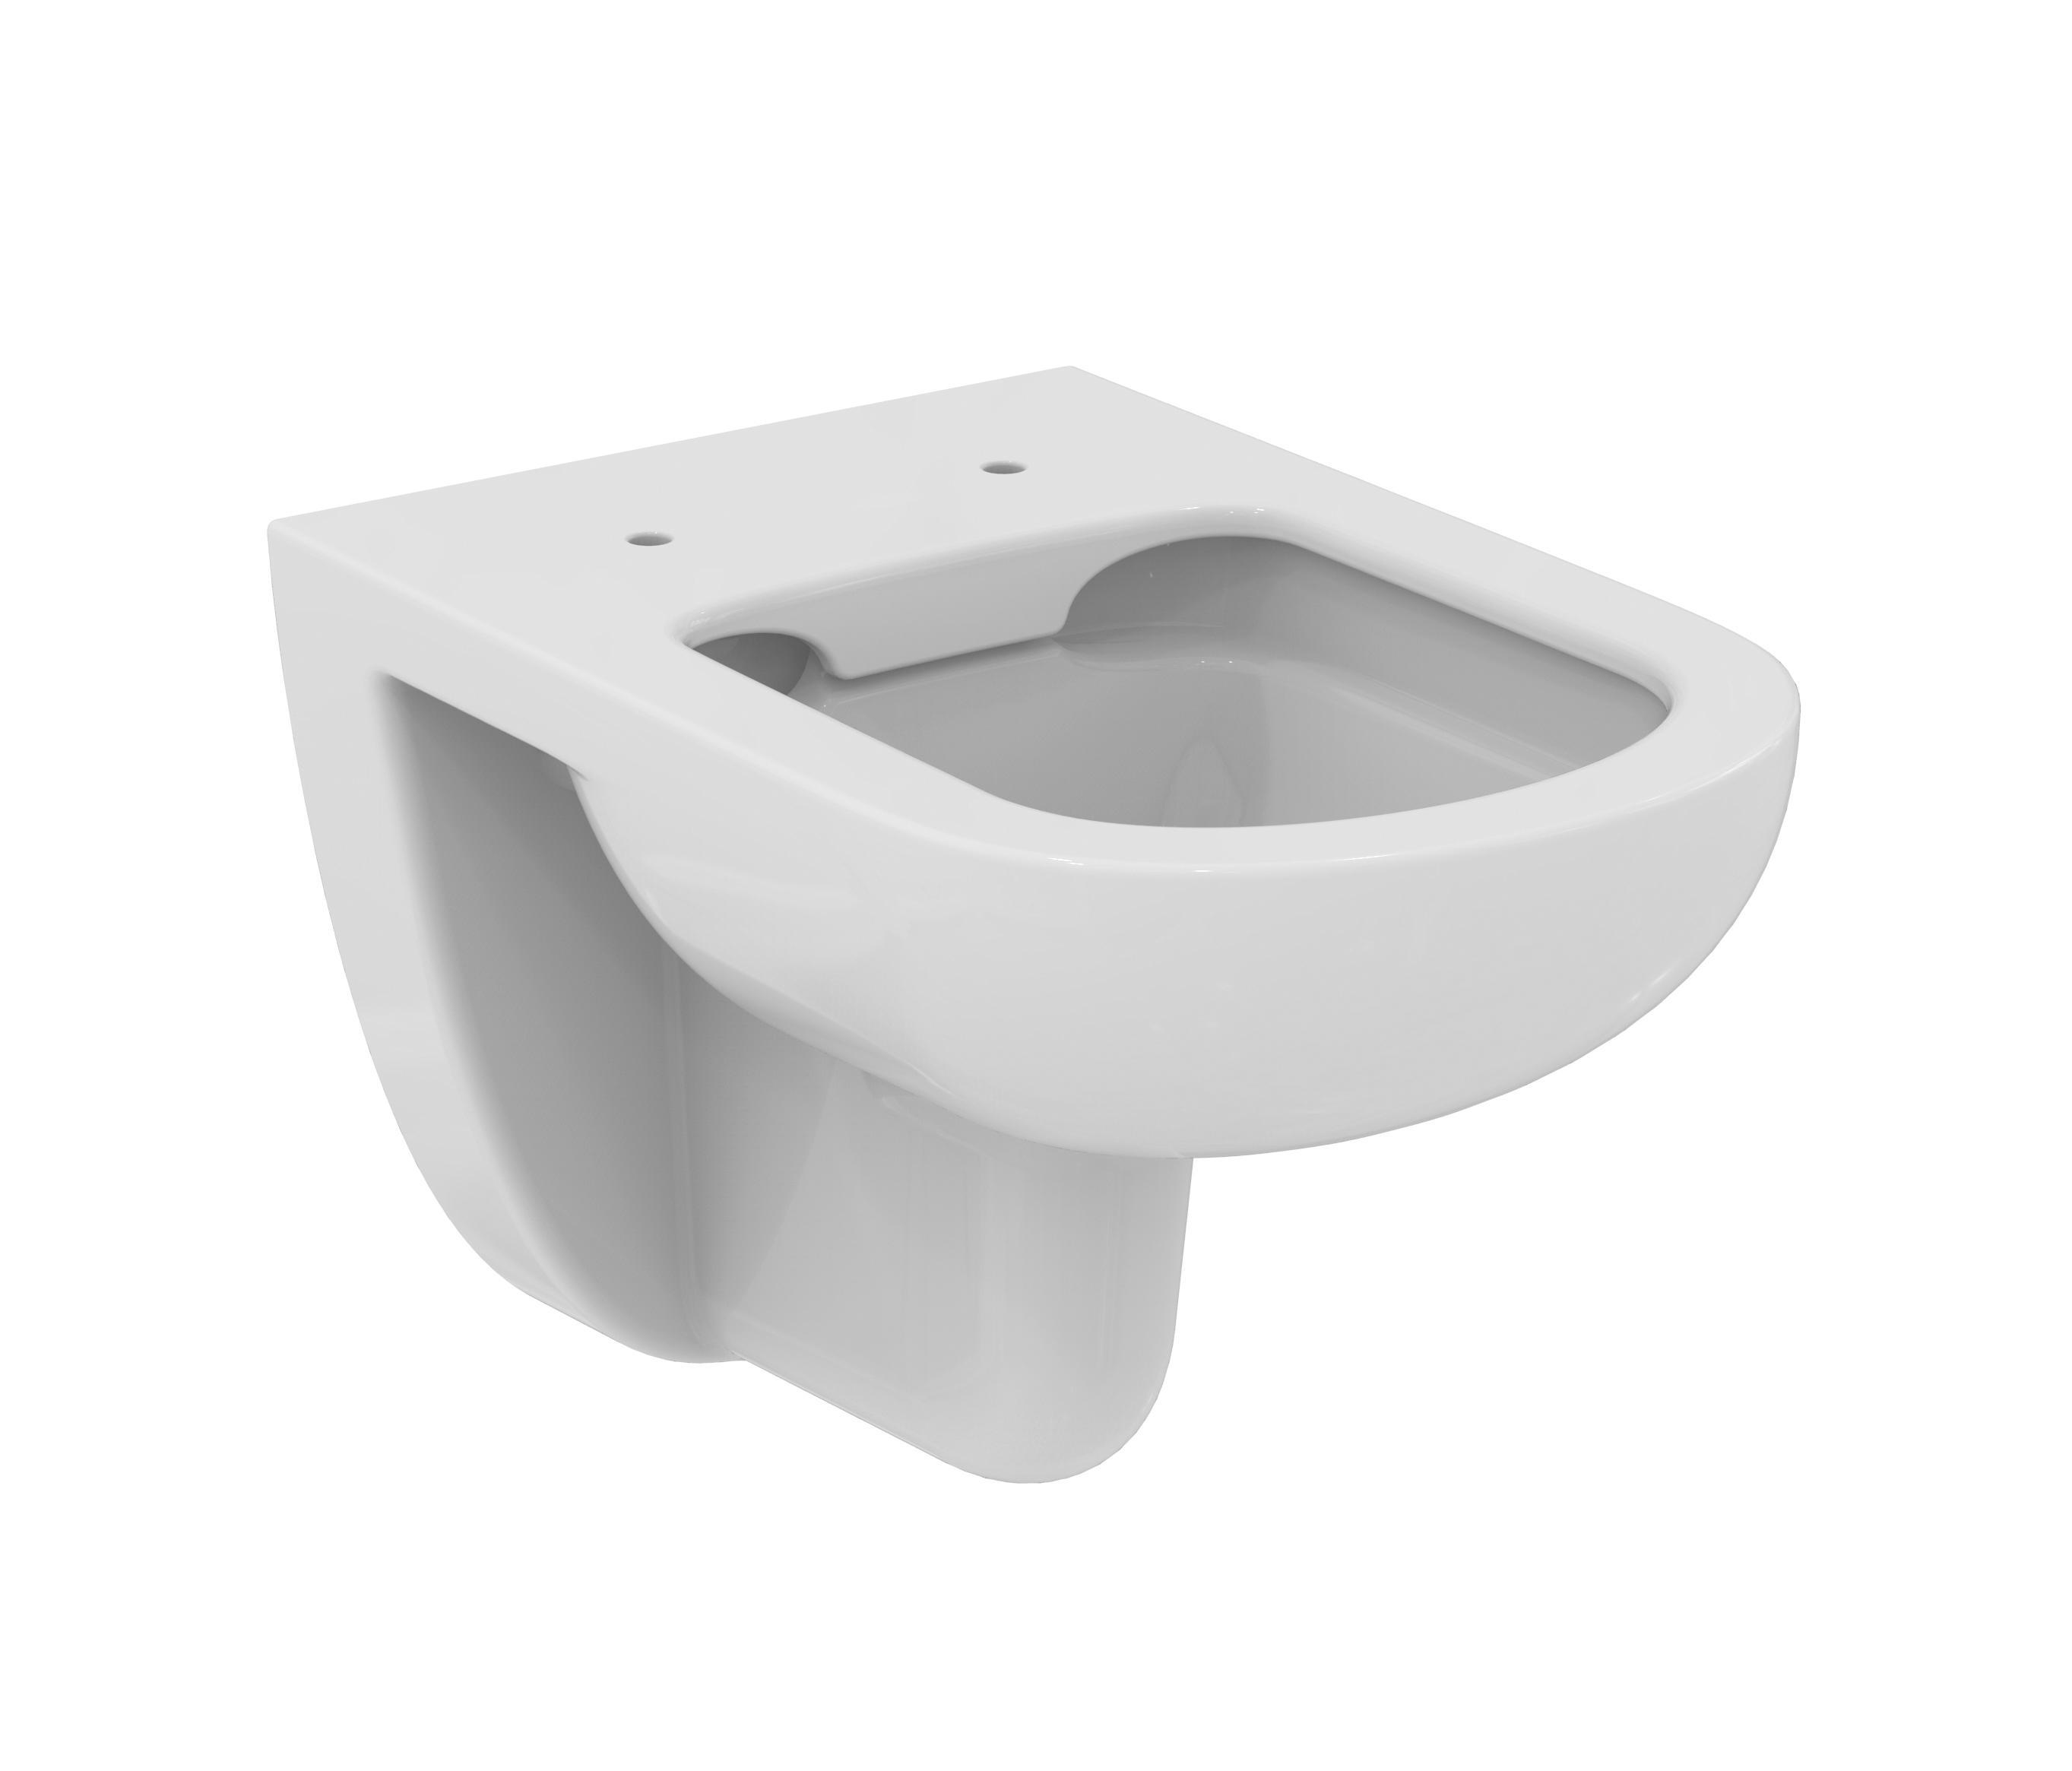 eurovit wandtiefsp lklosett ohne sp lrand toilets from ideal standard architonic. Black Bedroom Furniture Sets. Home Design Ideas